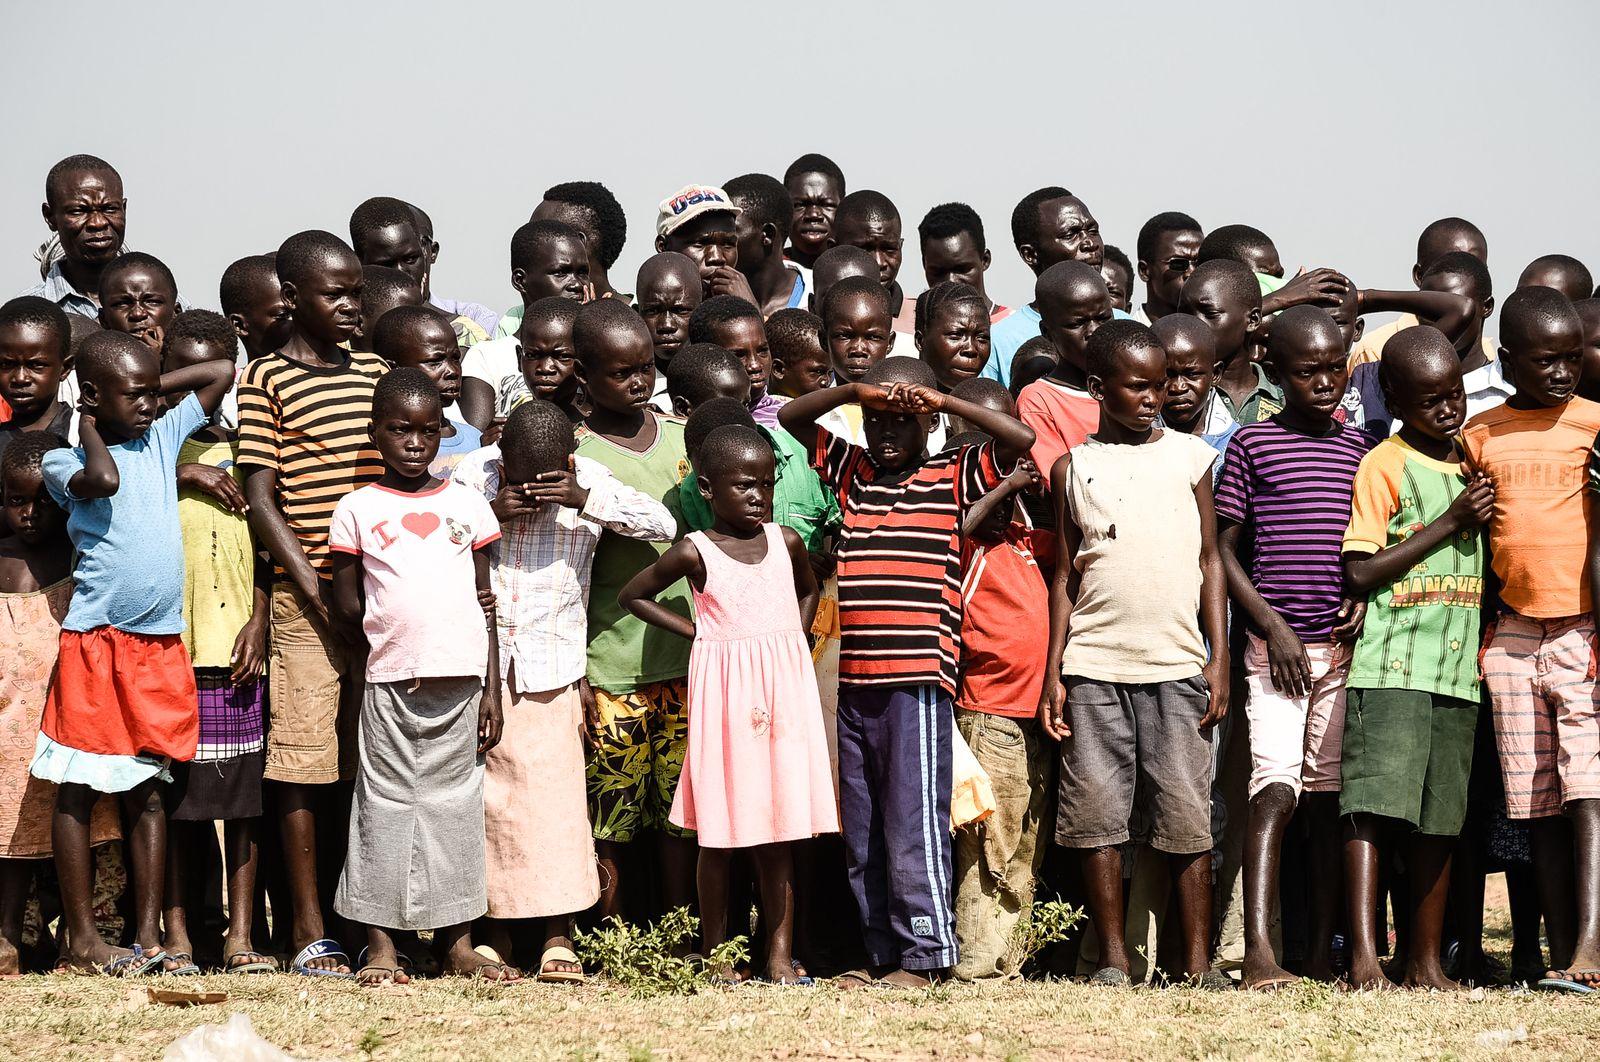 UGANDA-SSUDAN-REFUGEE-BIDIBIDI-SOCIAL-DANCE